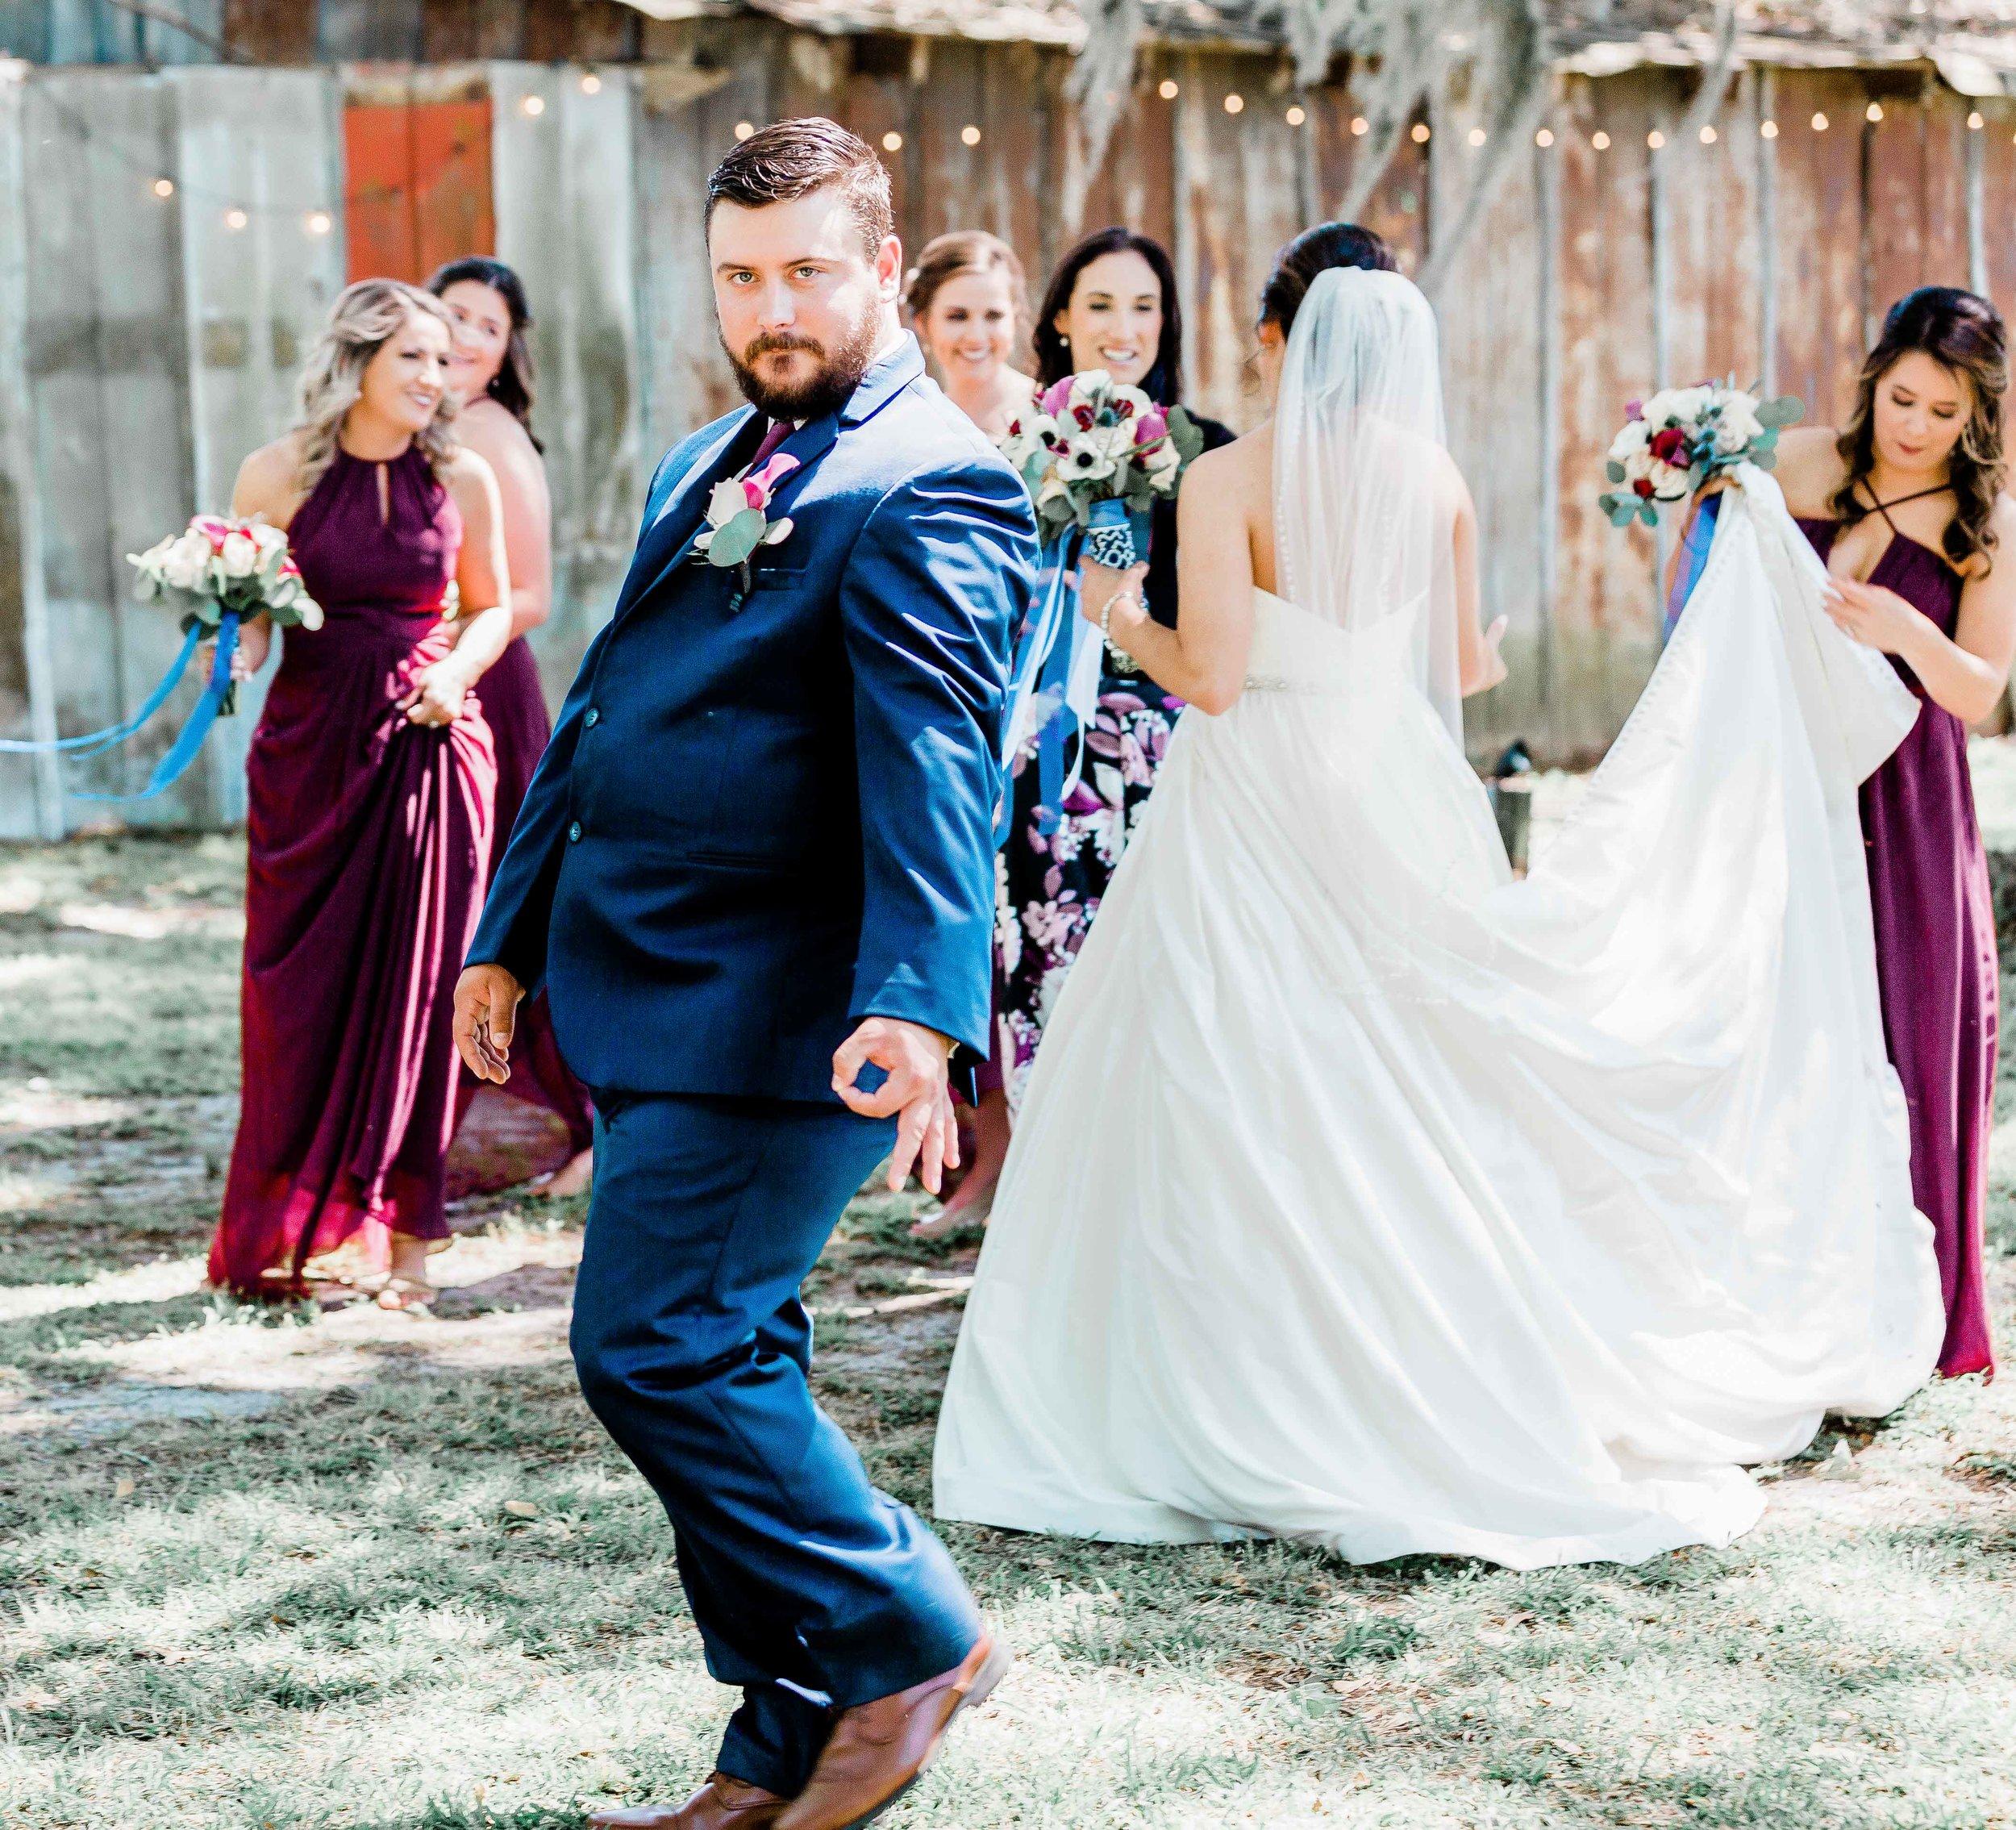 20190427-Southern Lens Photography- Savannah Wedding Photographer-Screven and Caroline-201960.jpg